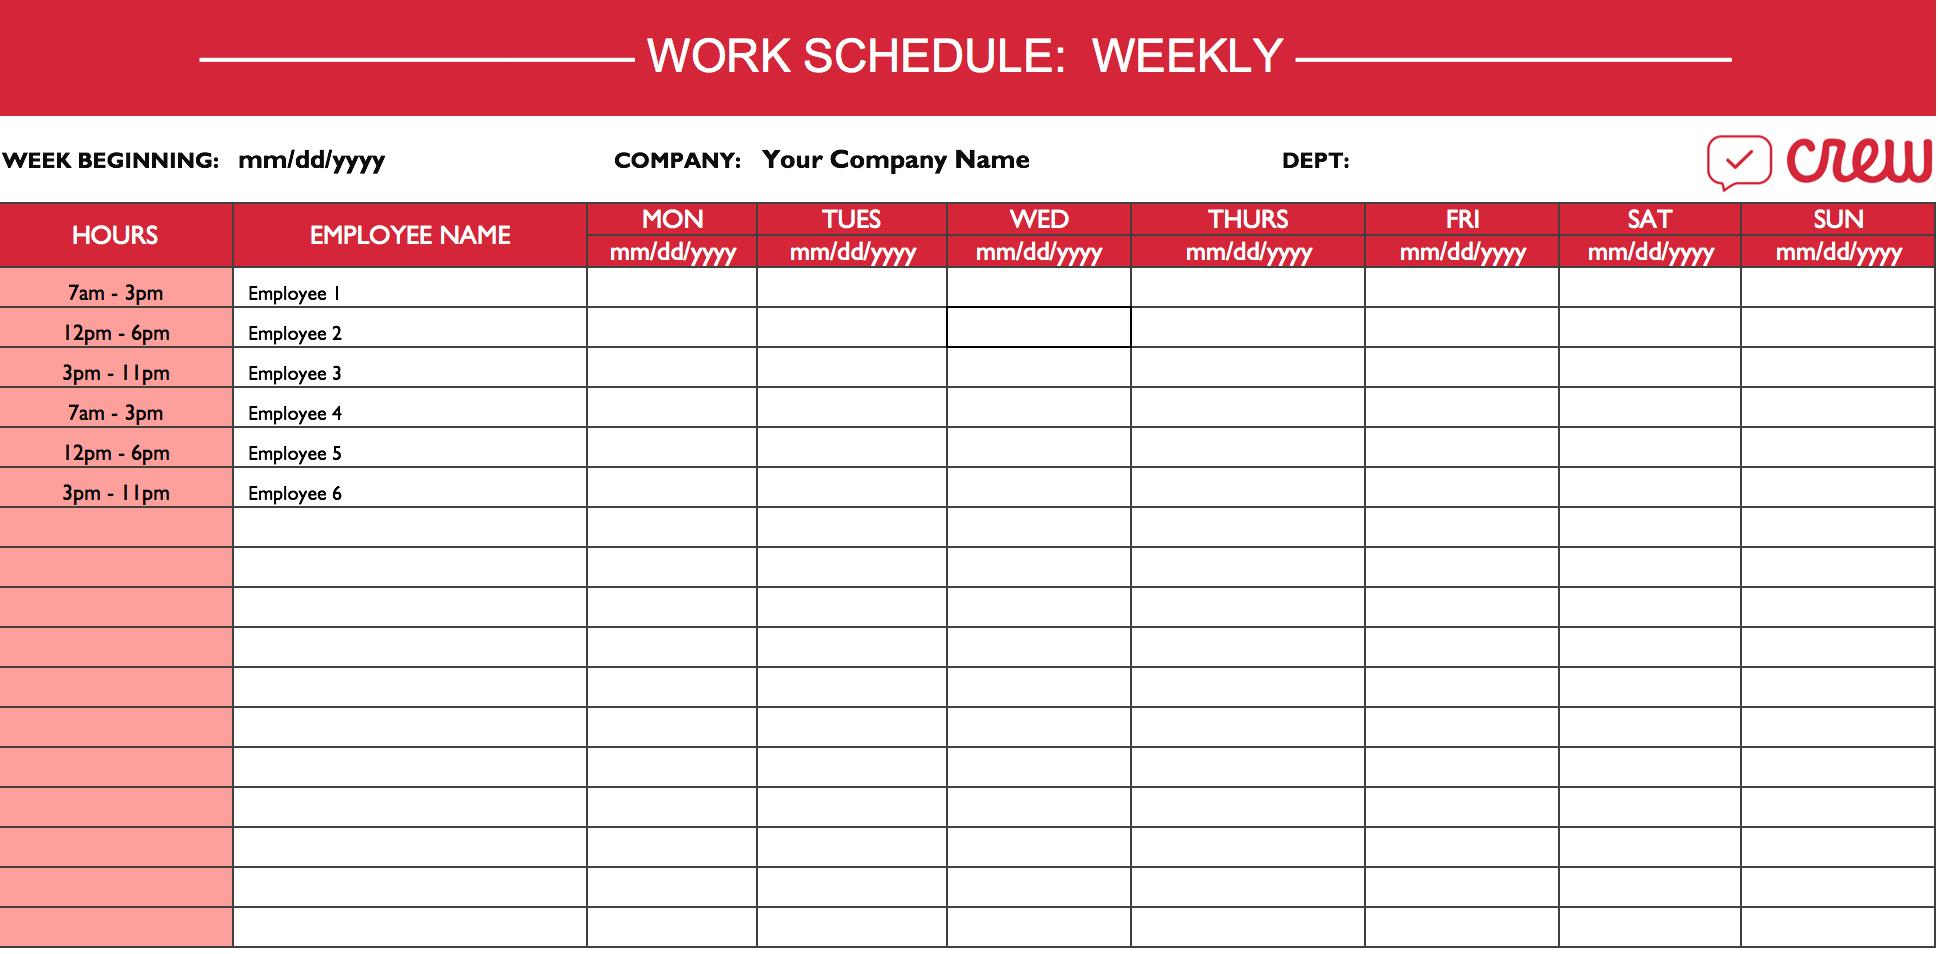 Weekly Work Schedule Template I Crew With Employee Work Schedule Spreadsheet